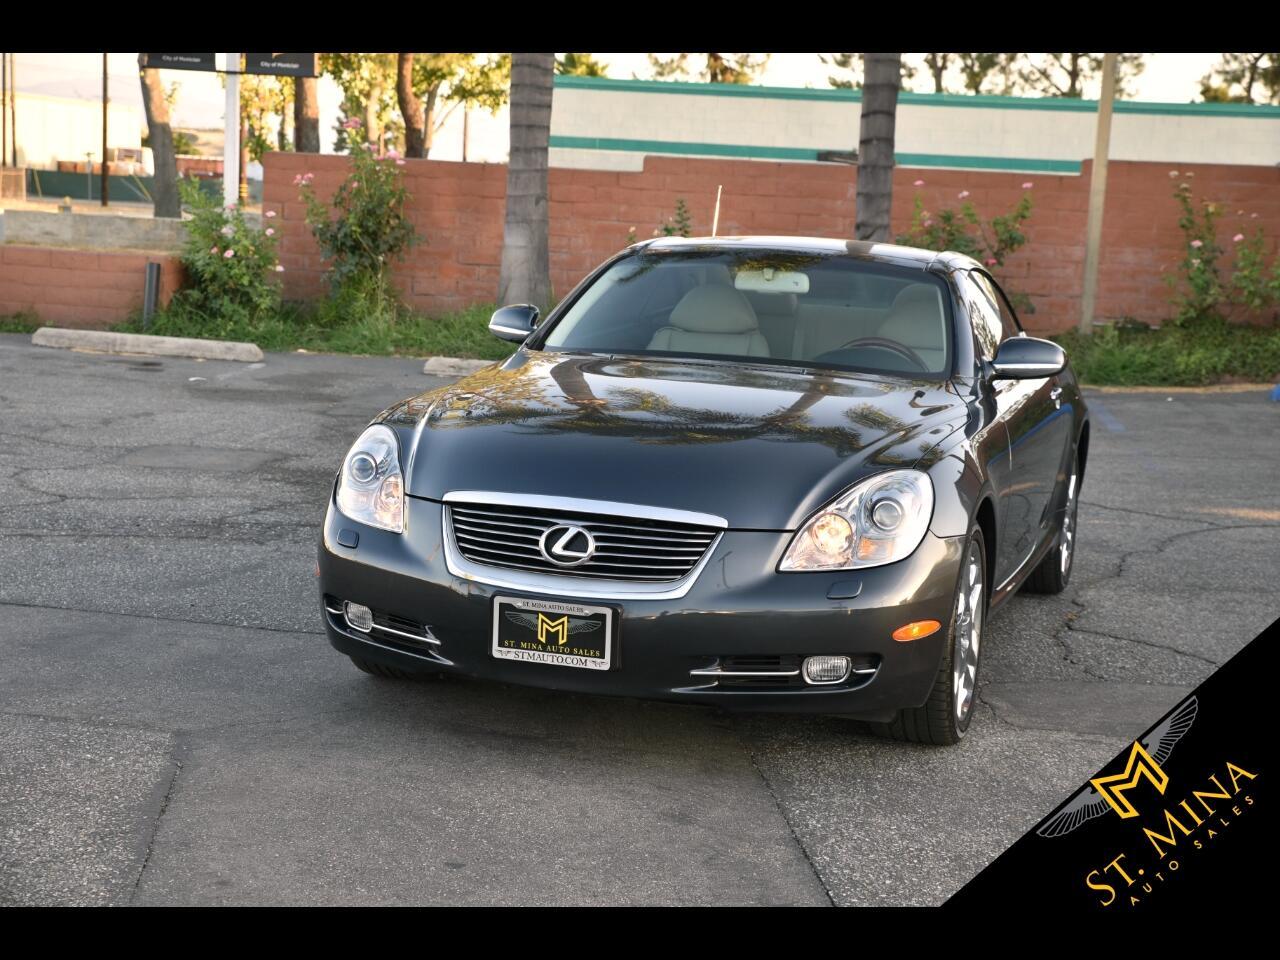 2008 Lexus SC 430 Convertible